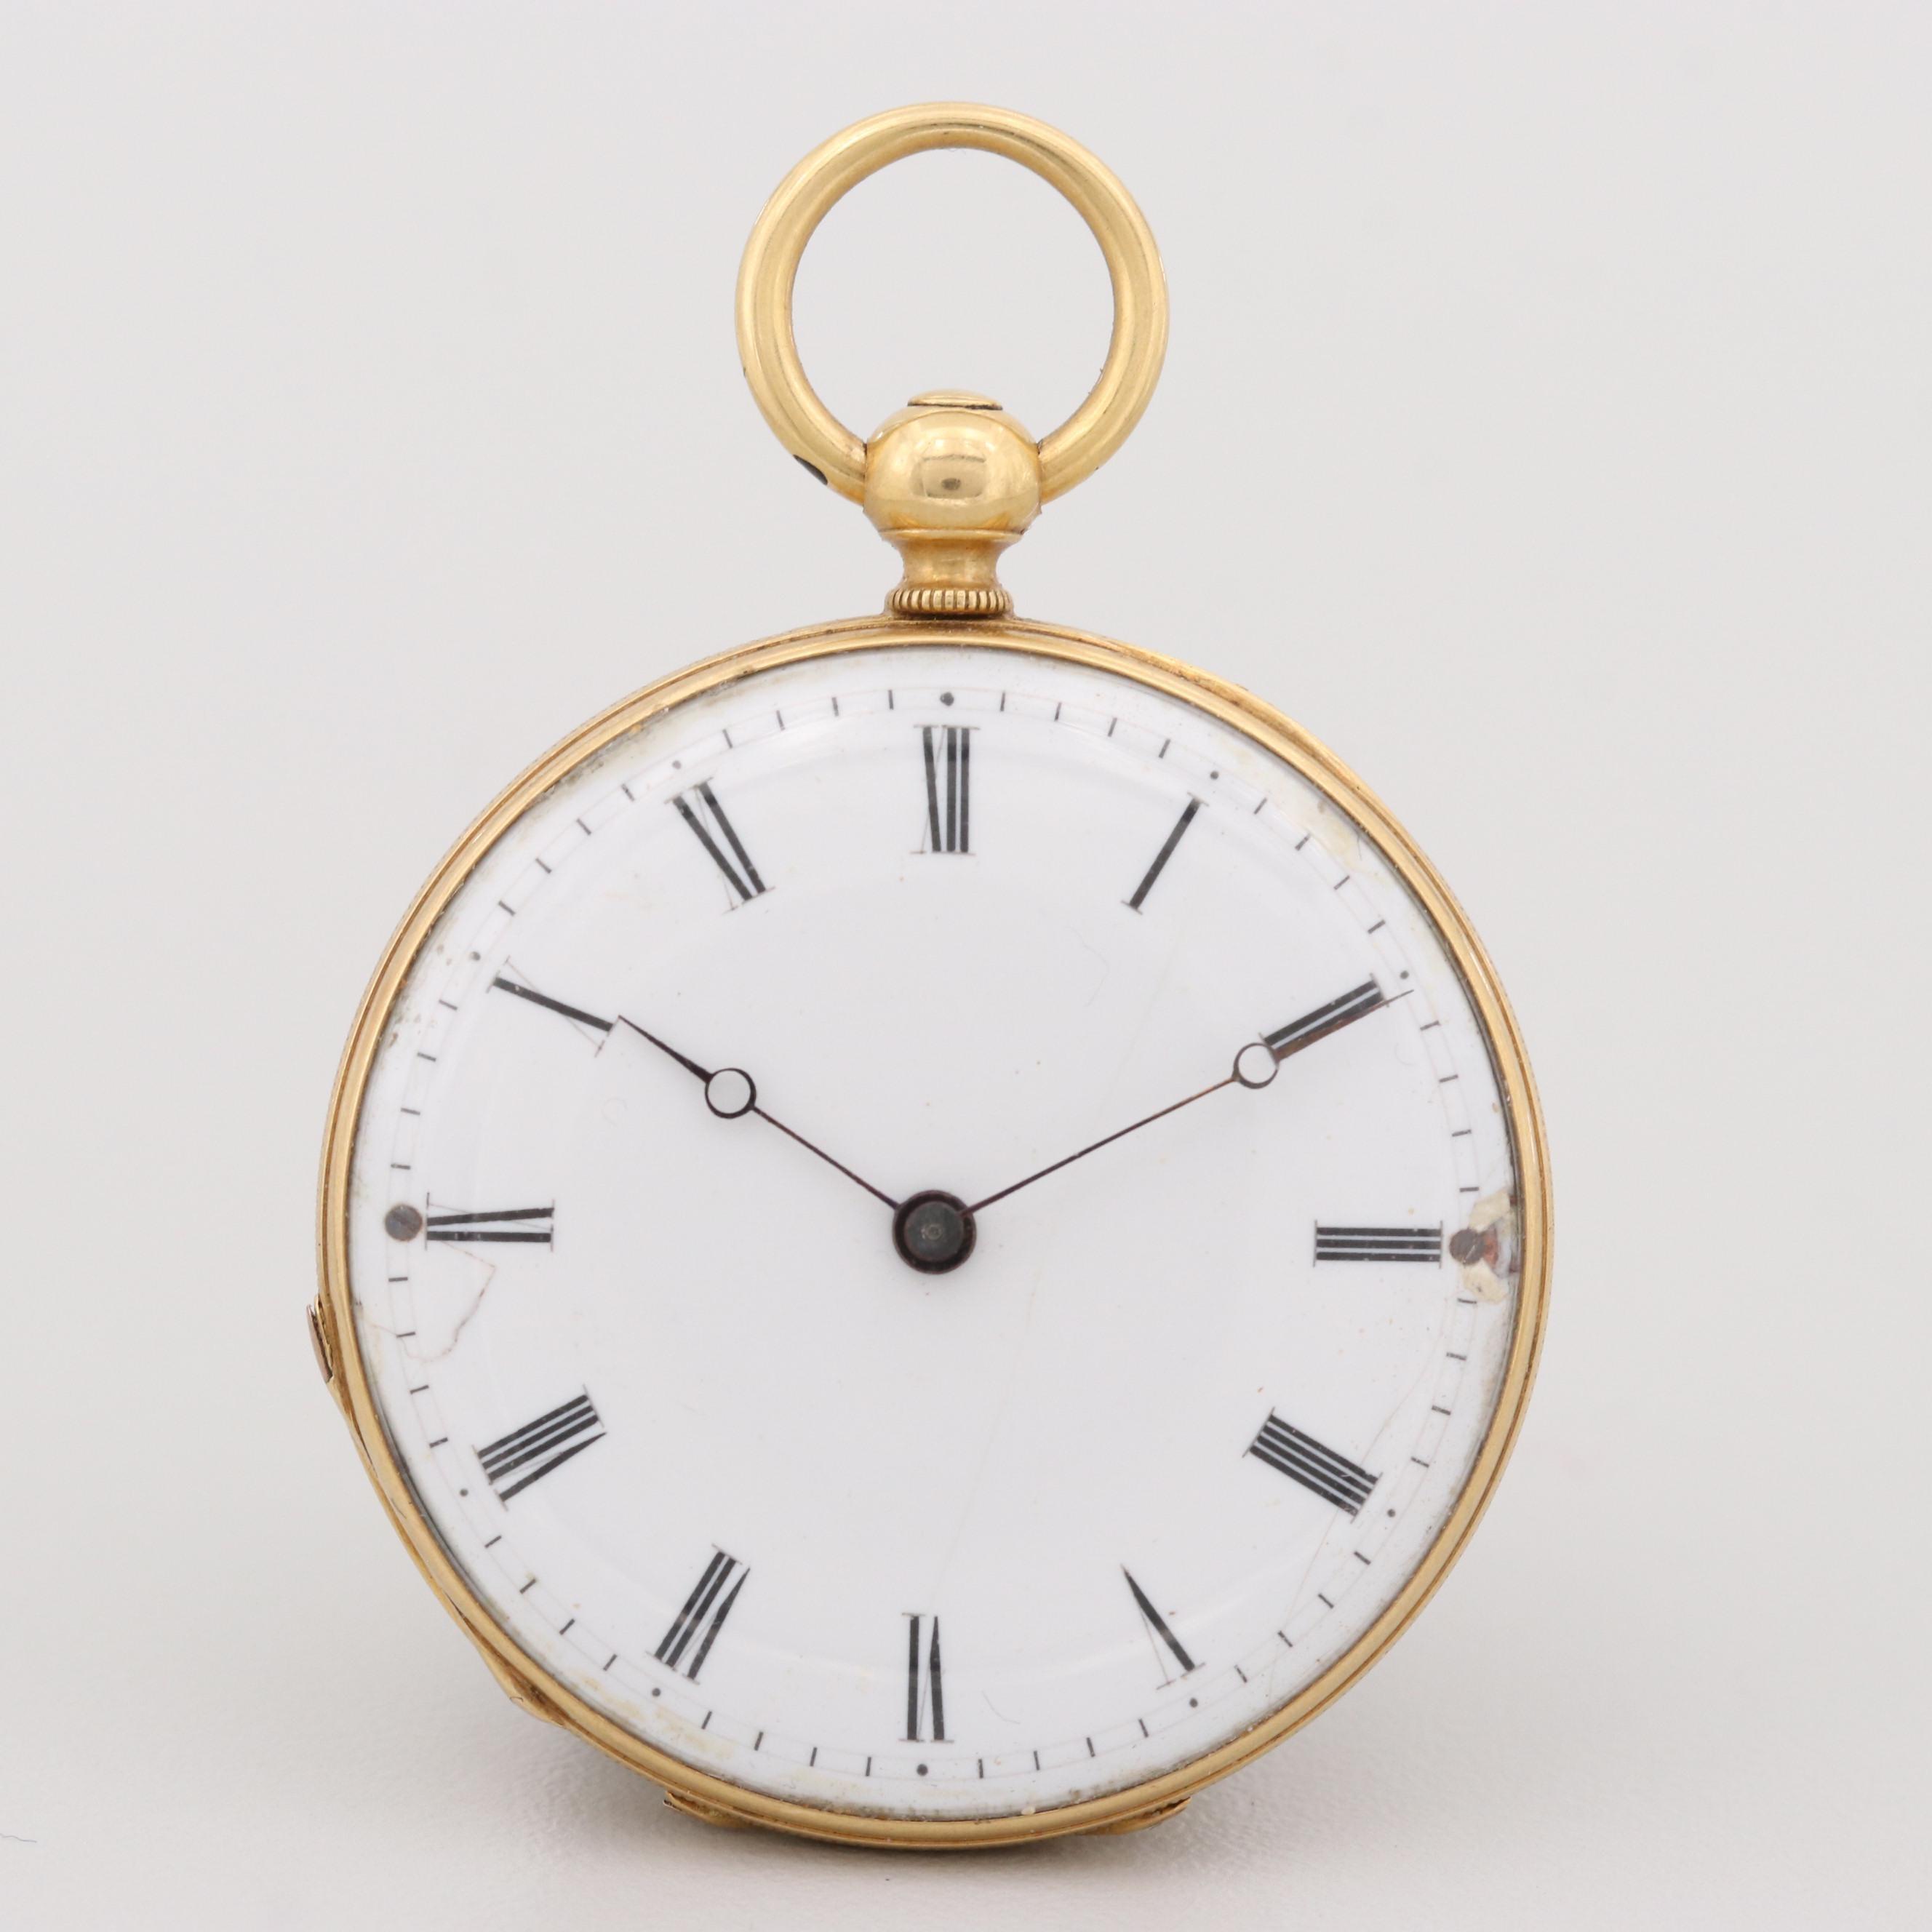 Swiss 18K Yellow Gold Key Wind and Set Pocket Watch